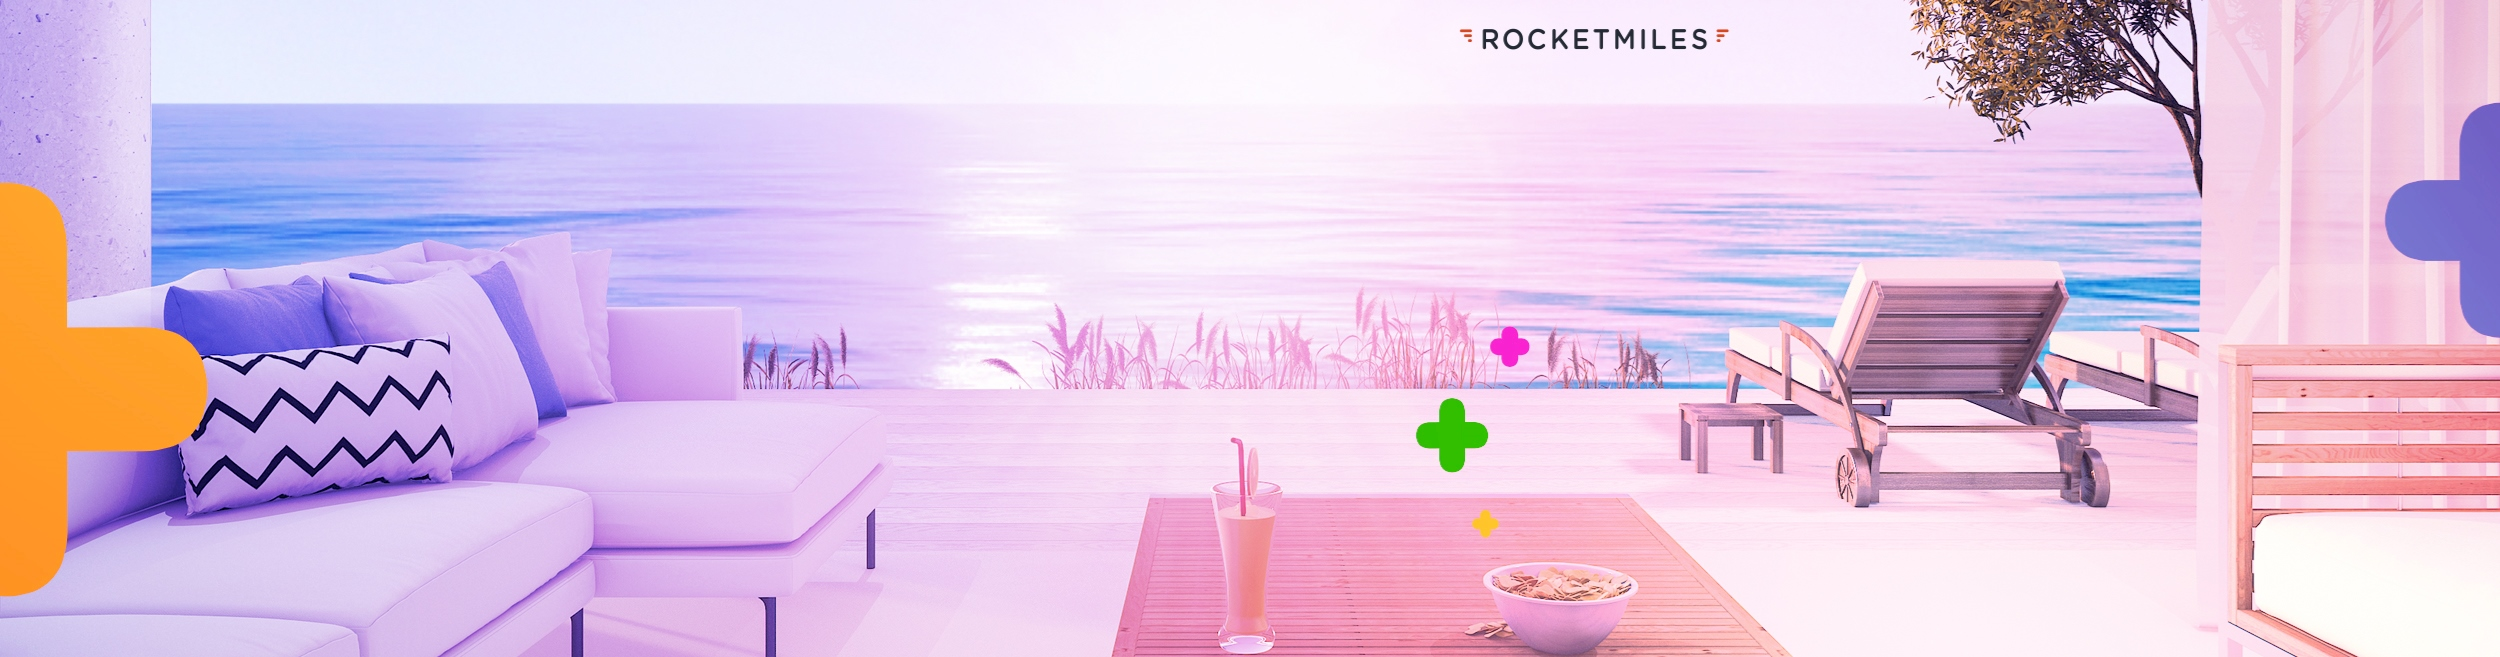 rocketmiles